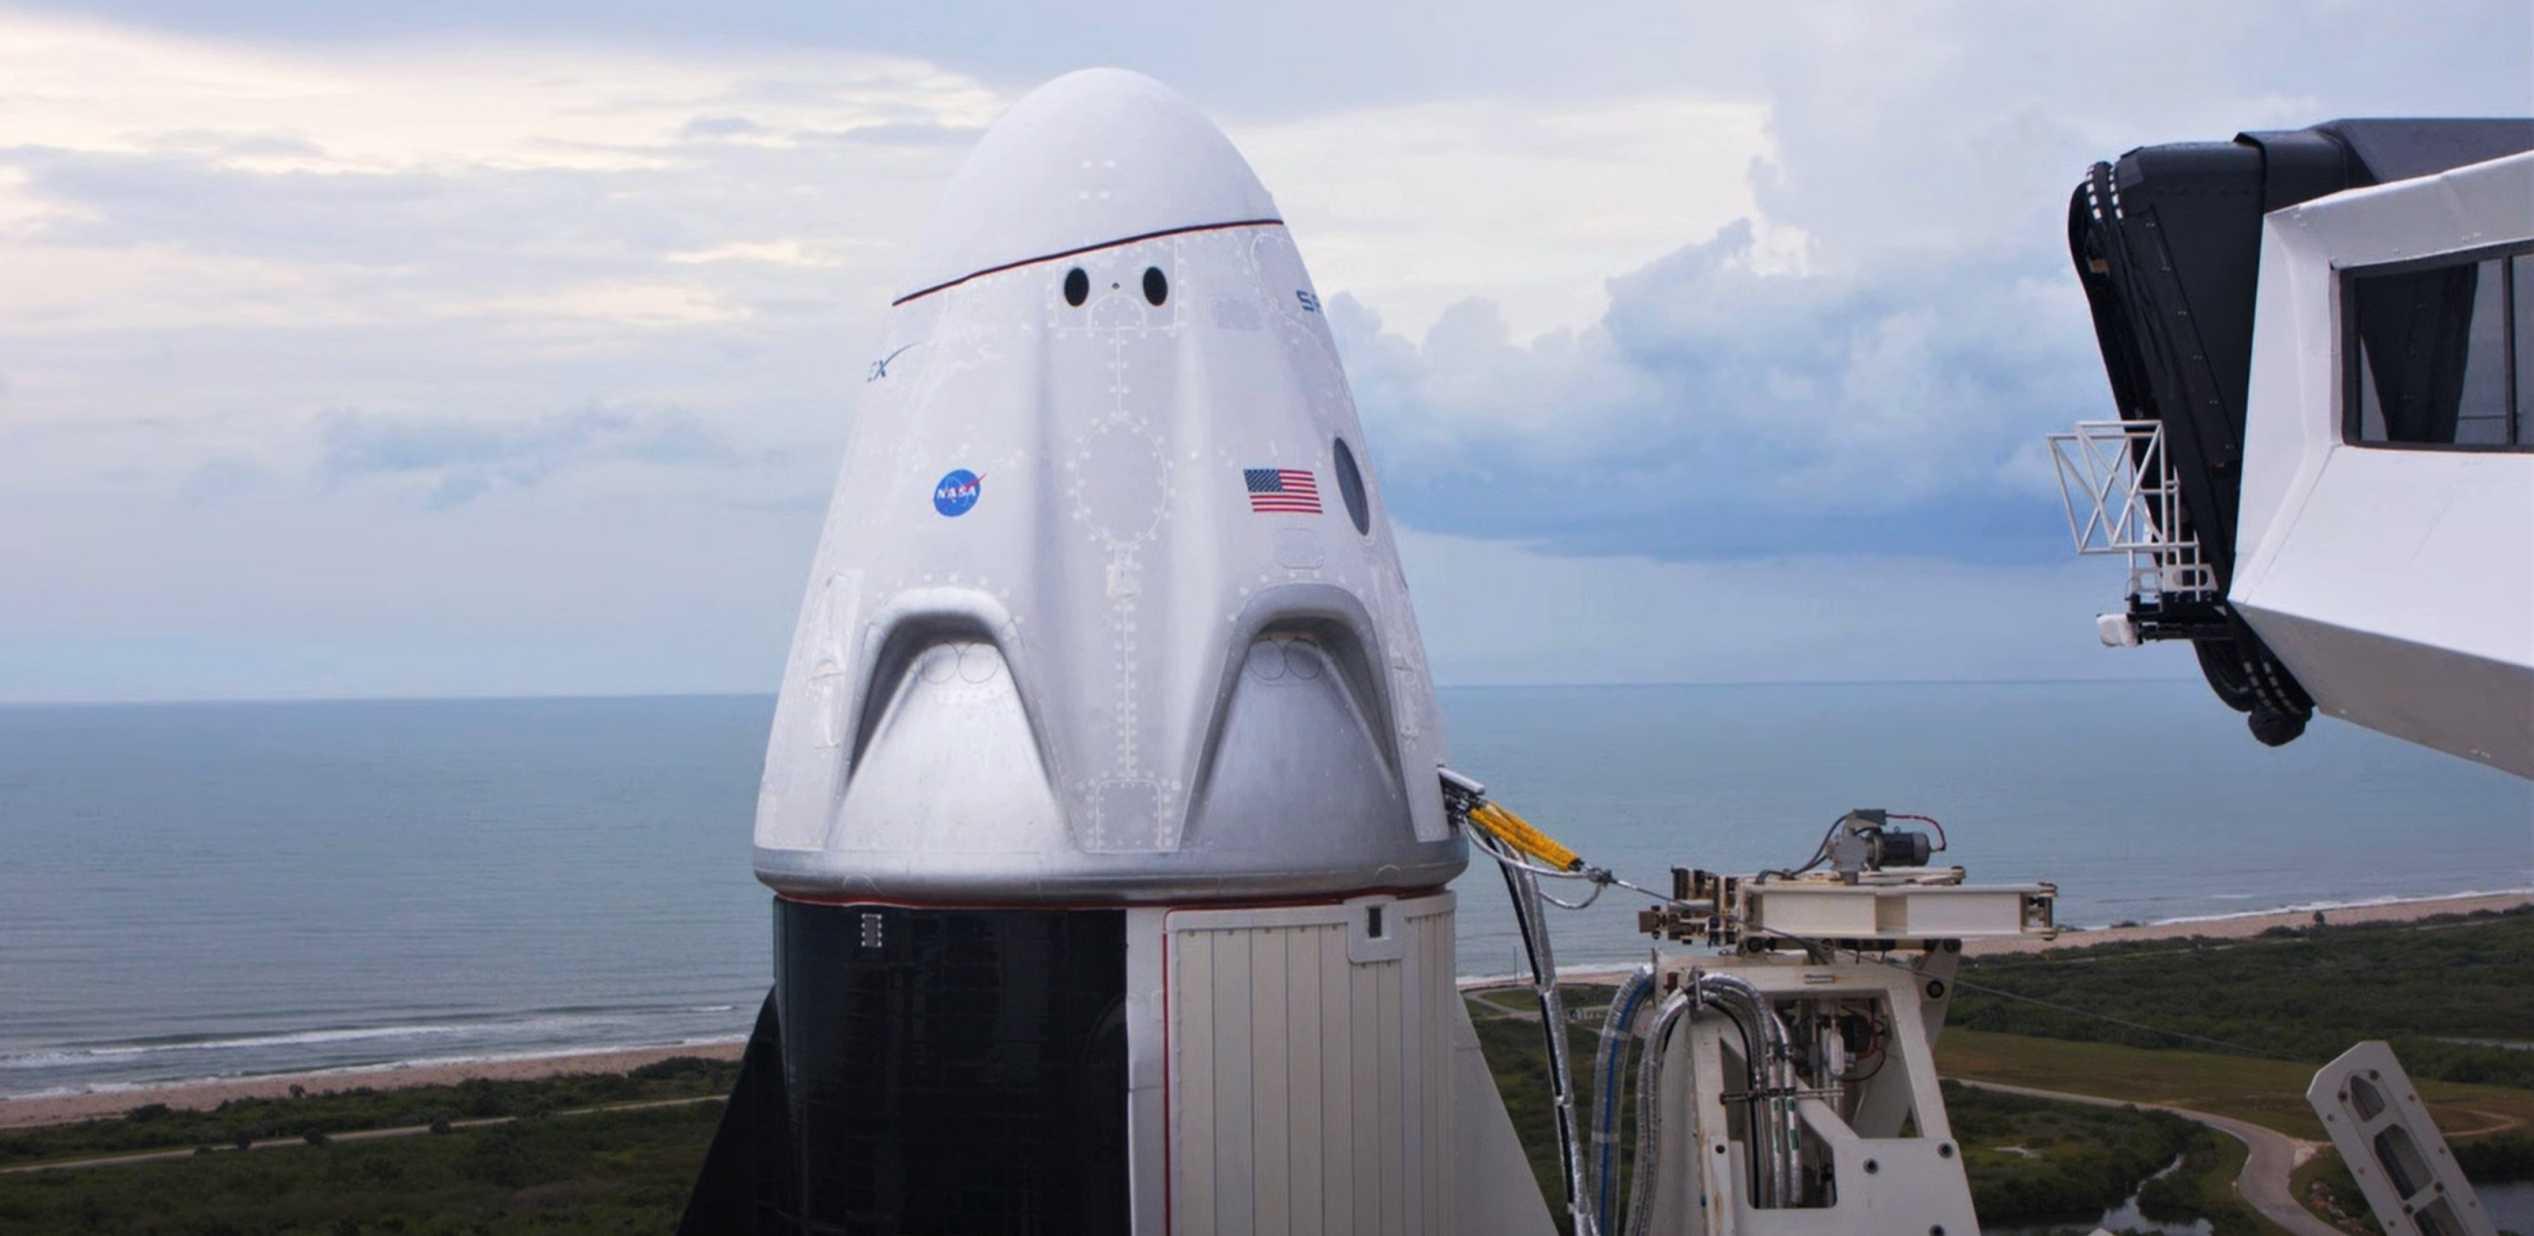 Crew Dragon C206 F9 B1058 Demo-2 052720 webcast (SpaceX) CAA retract 2 (c)